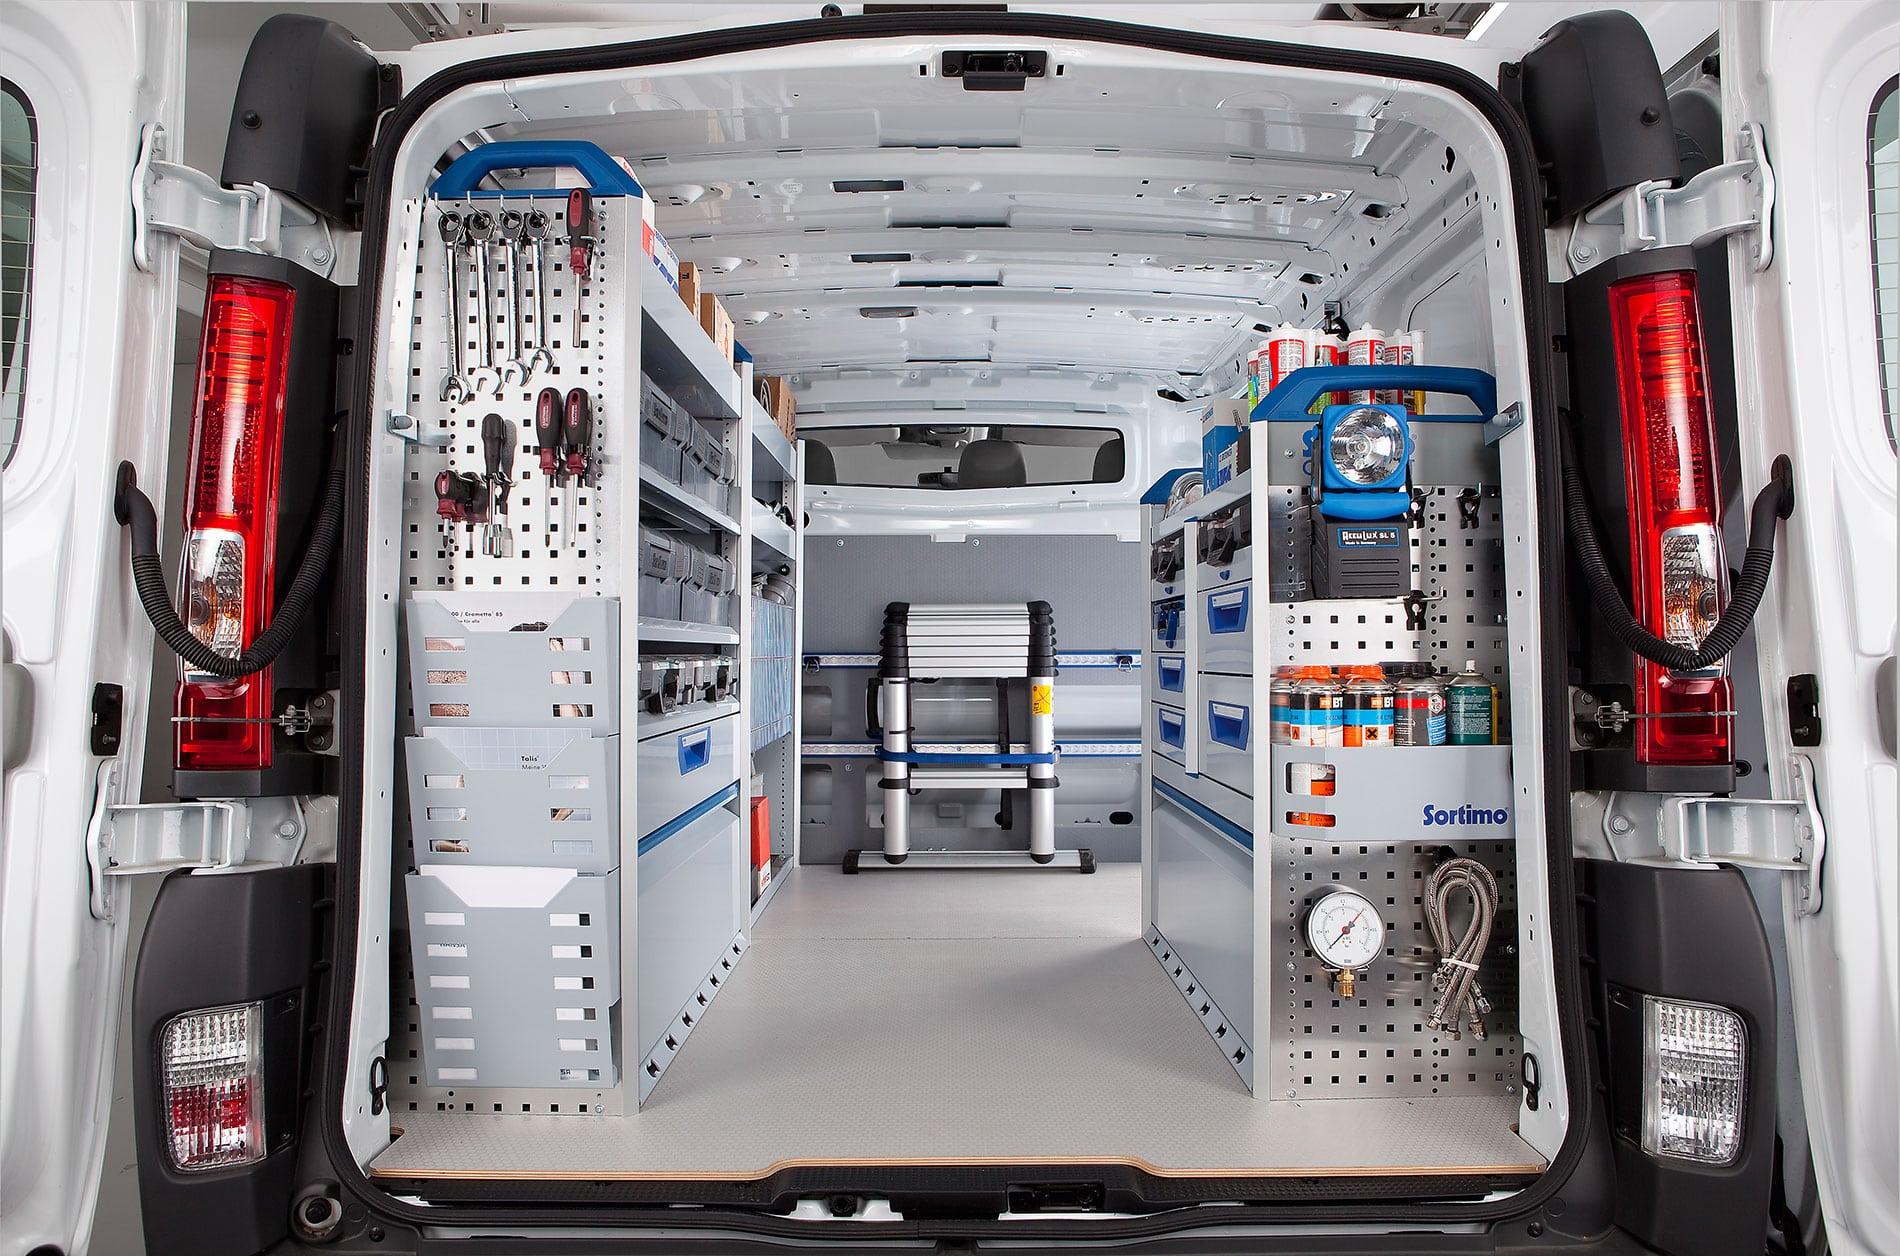 bilinnredning til firmabiler i oslo og omegn enjac. Black Bedroom Furniture Sets. Home Design Ideas